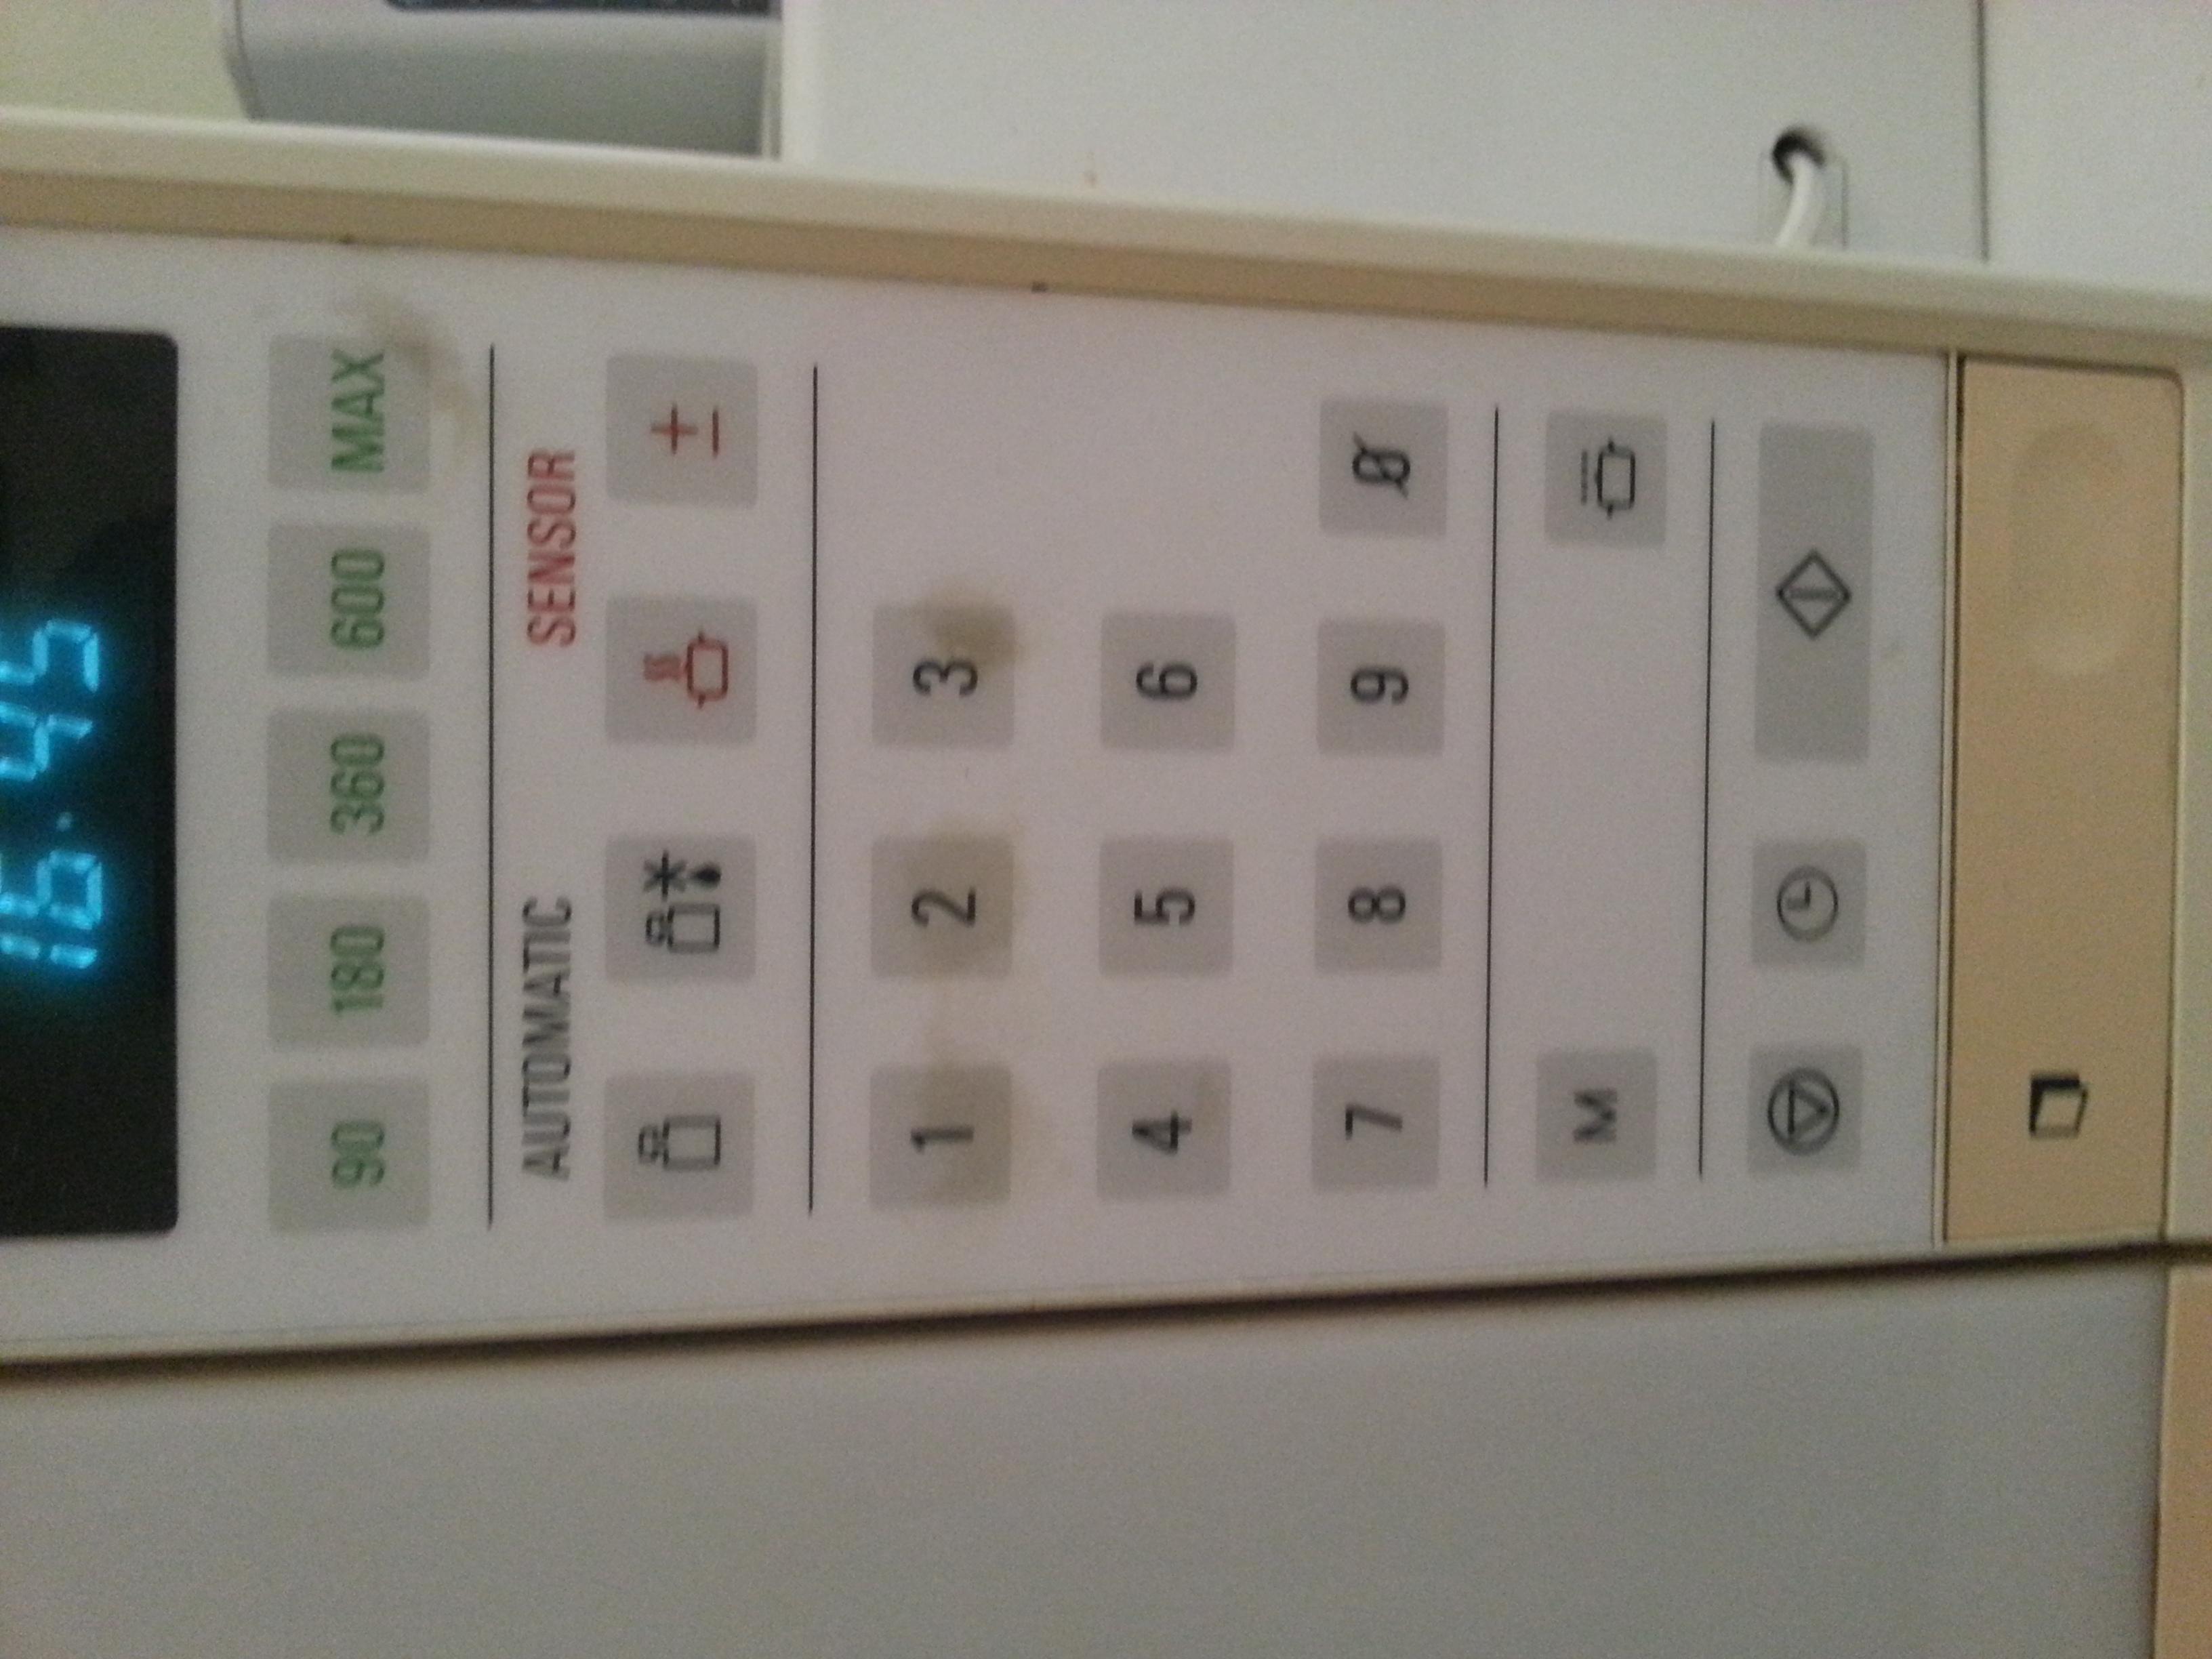 welches ist das garen symbol mikrowelle. Black Bedroom Furniture Sets. Home Design Ideas